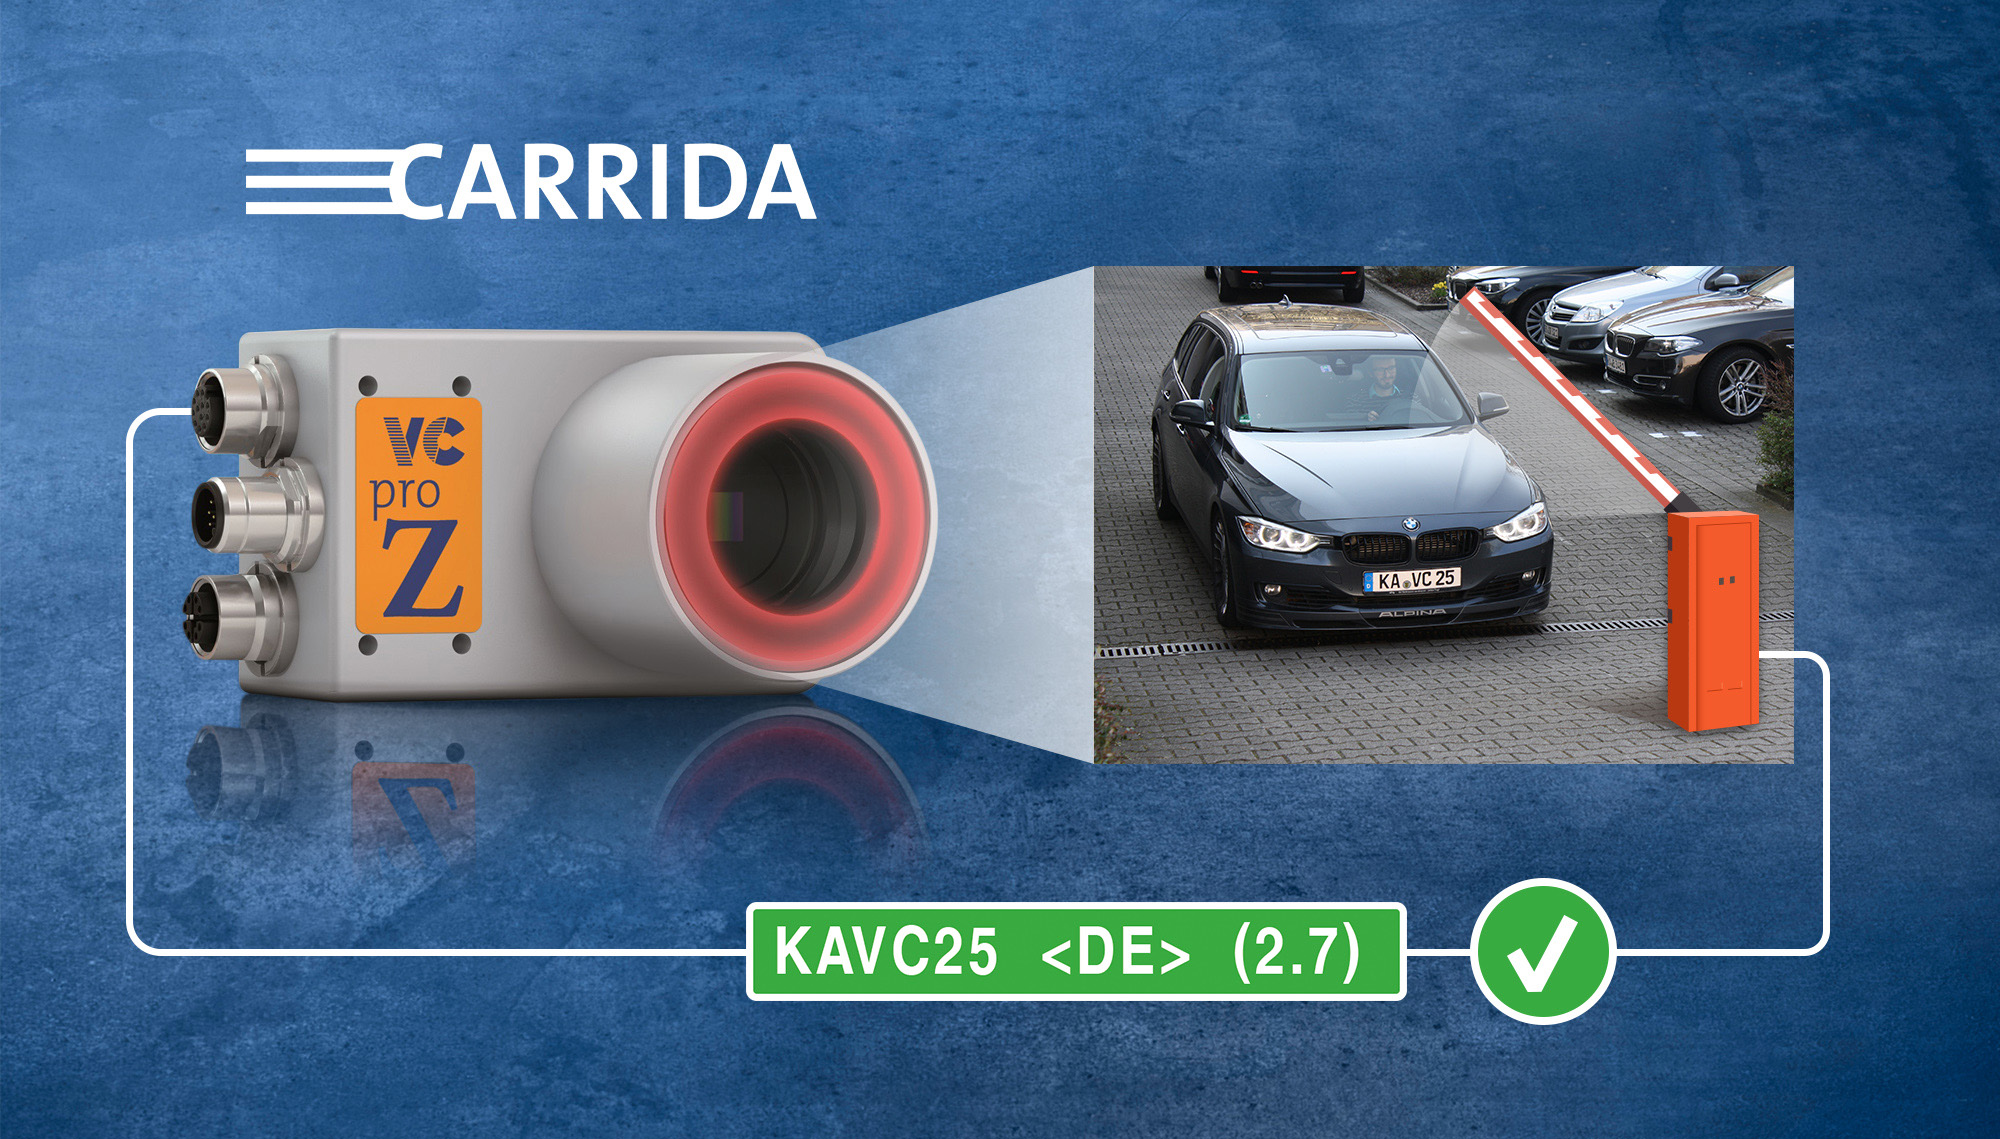 carrida_access_control_2000px